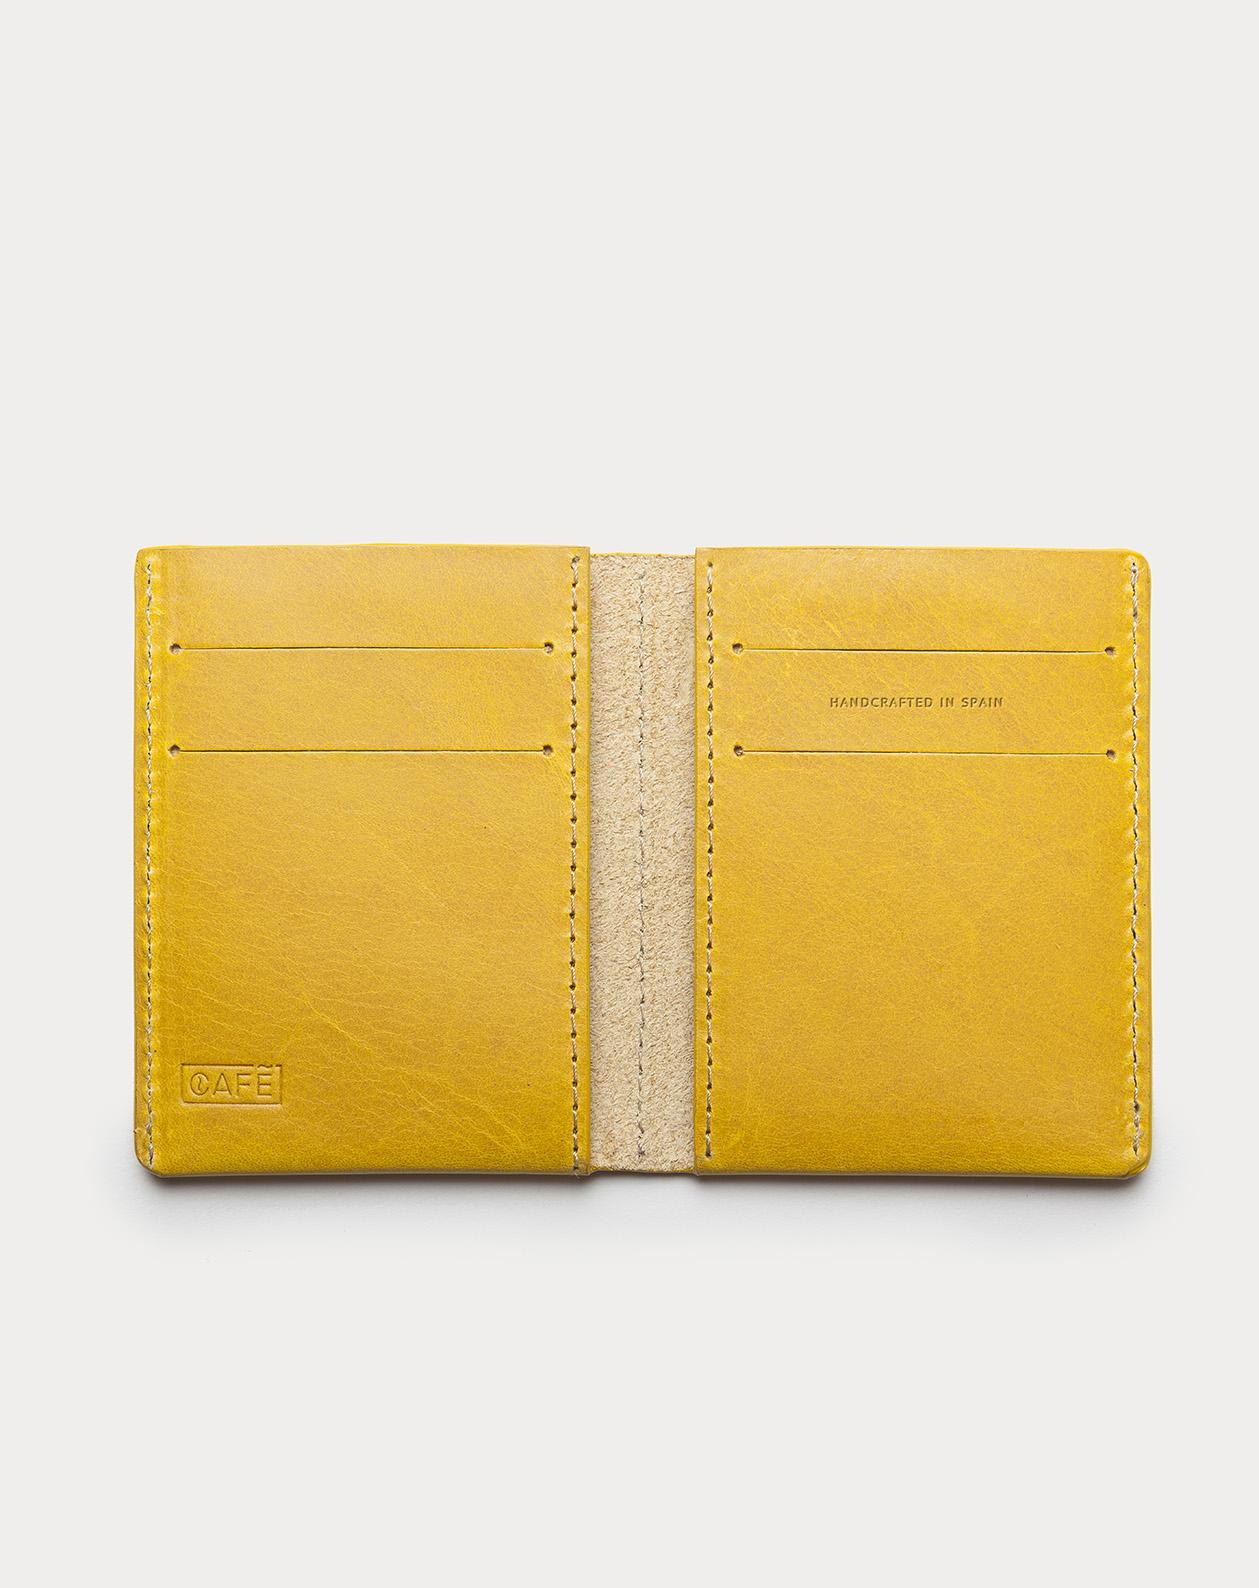 Ultra Slim Leather Wallet Jamaica Honey Mustard 3